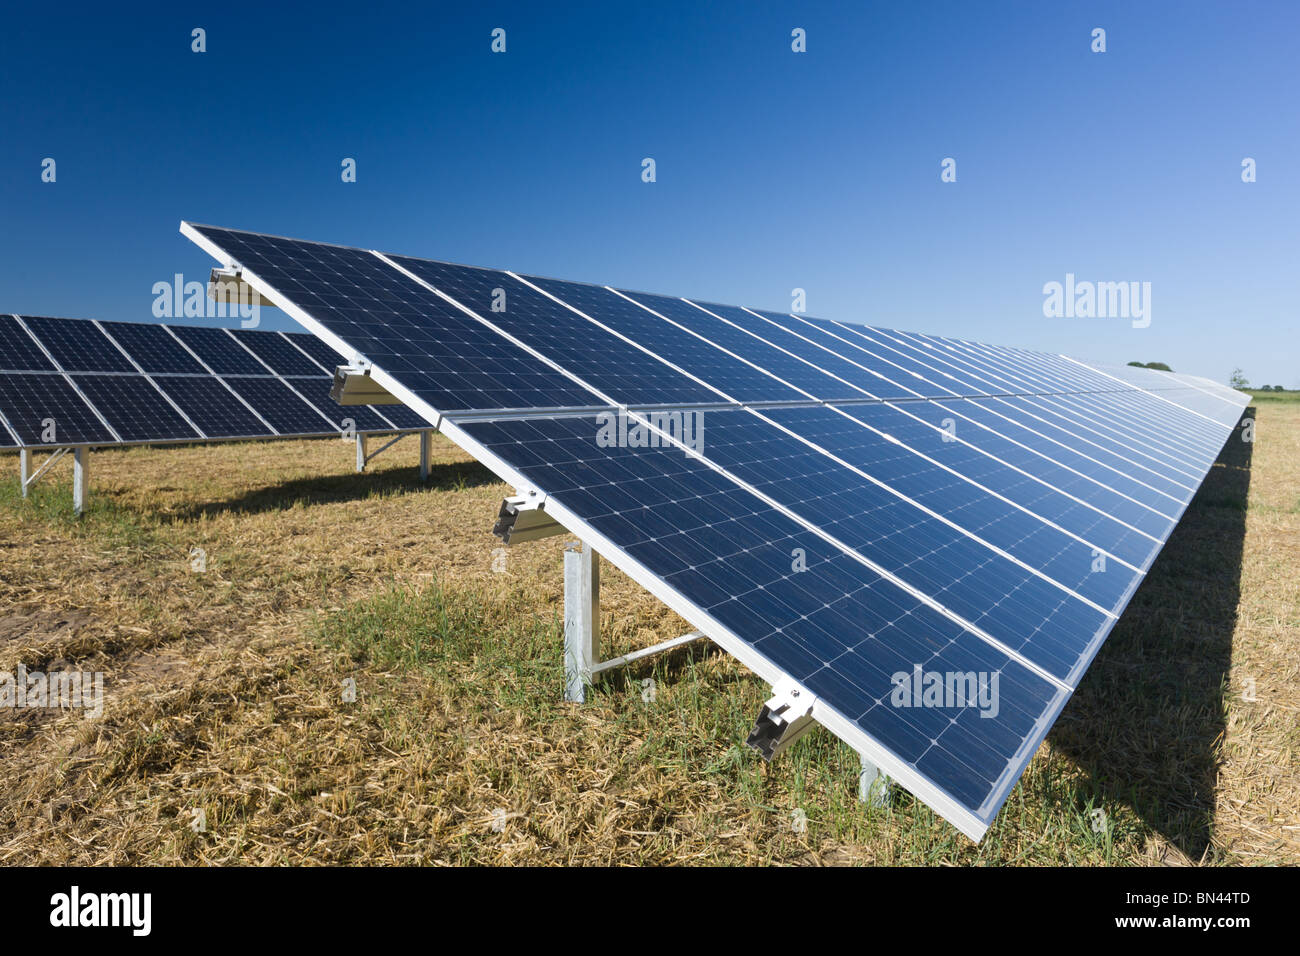 Photo voltaic modules in a solar farm - Stock Image